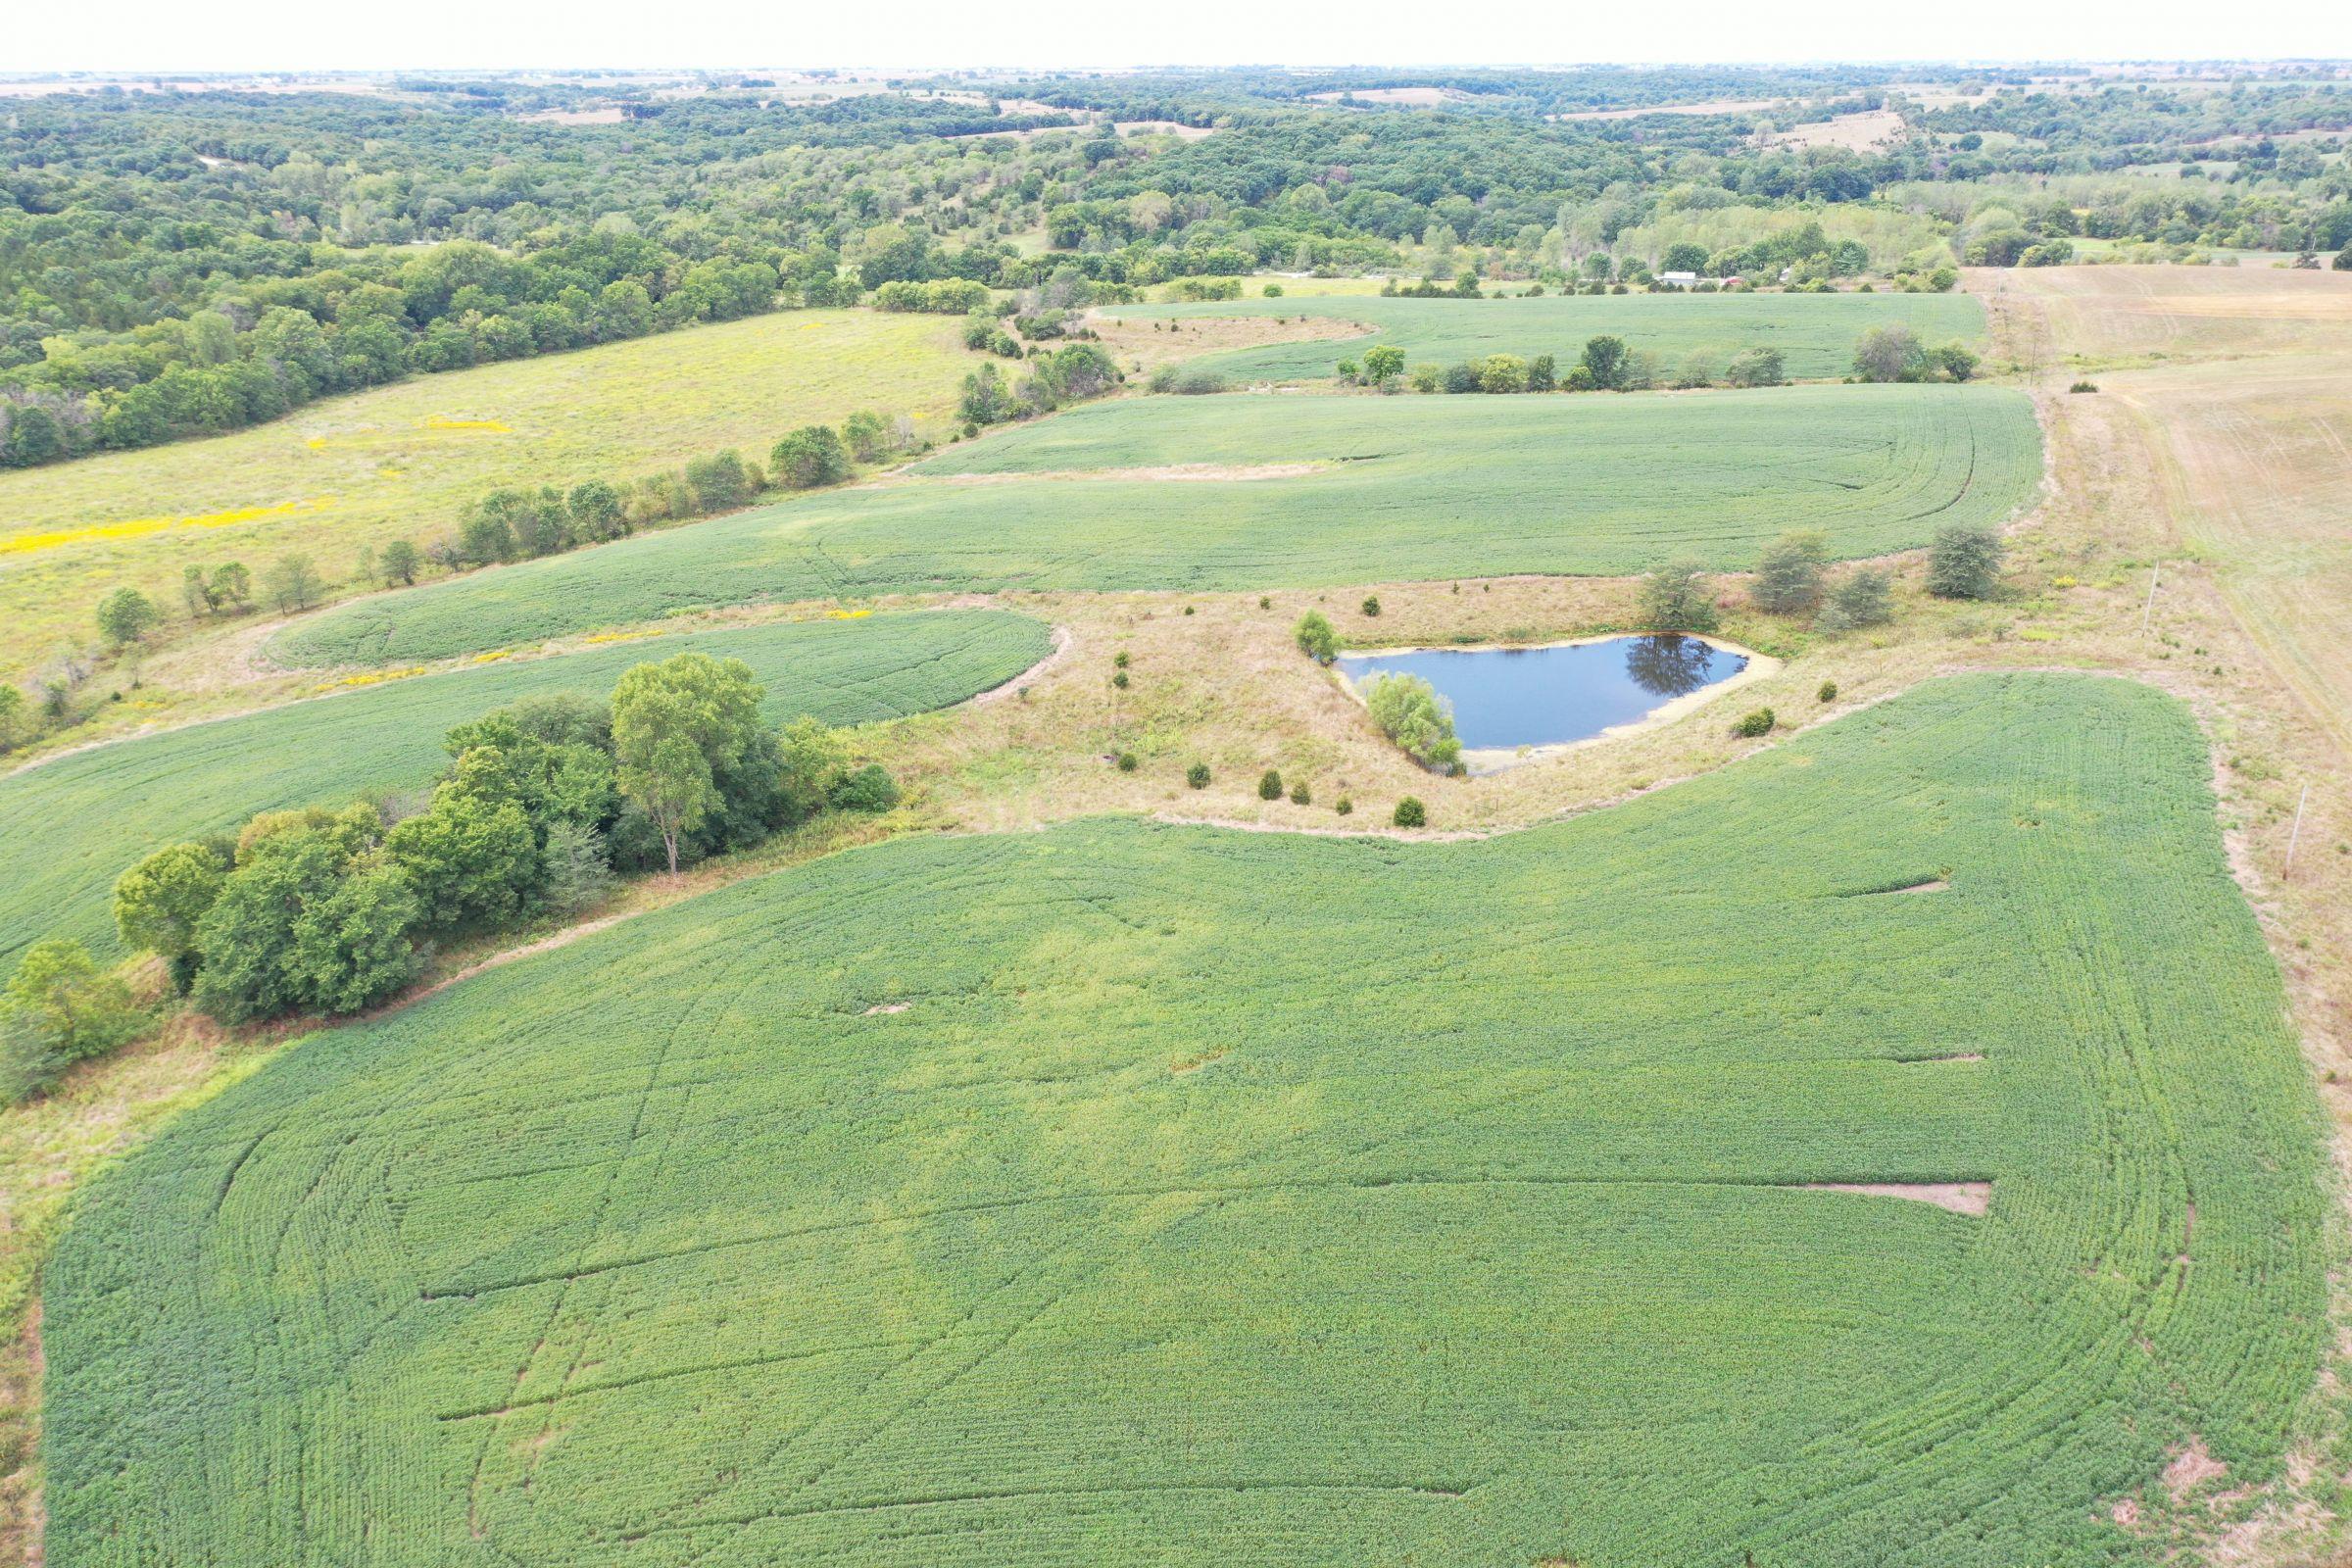 land-clarke-county-iowa-86-acres-listing-number-15147-2-2020-09-02-143404.jpg